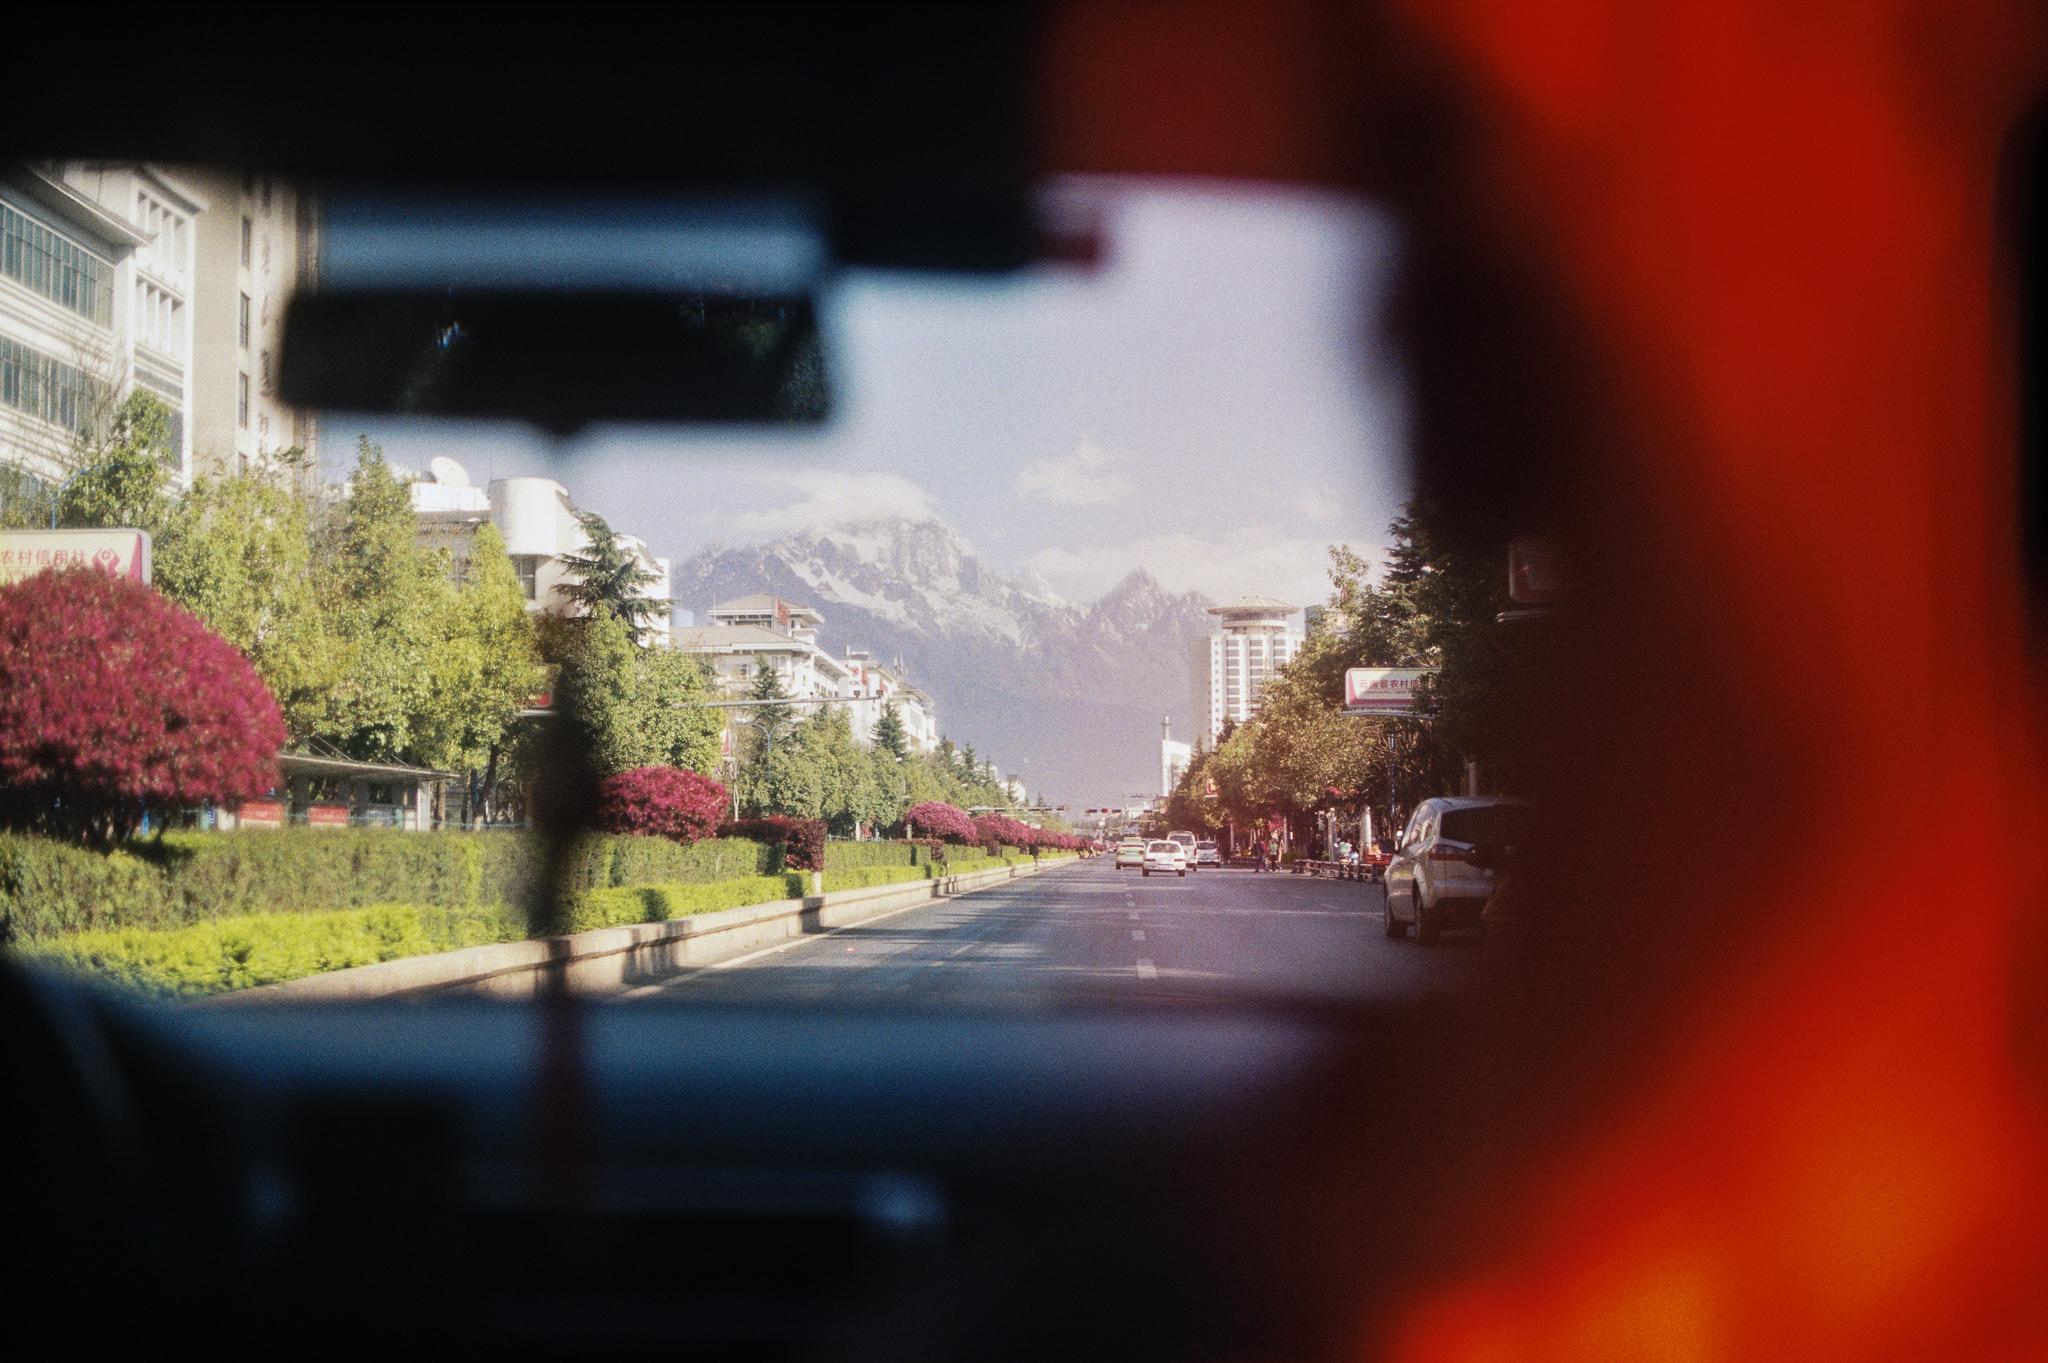 Backseat of a Taxi through Lijiang